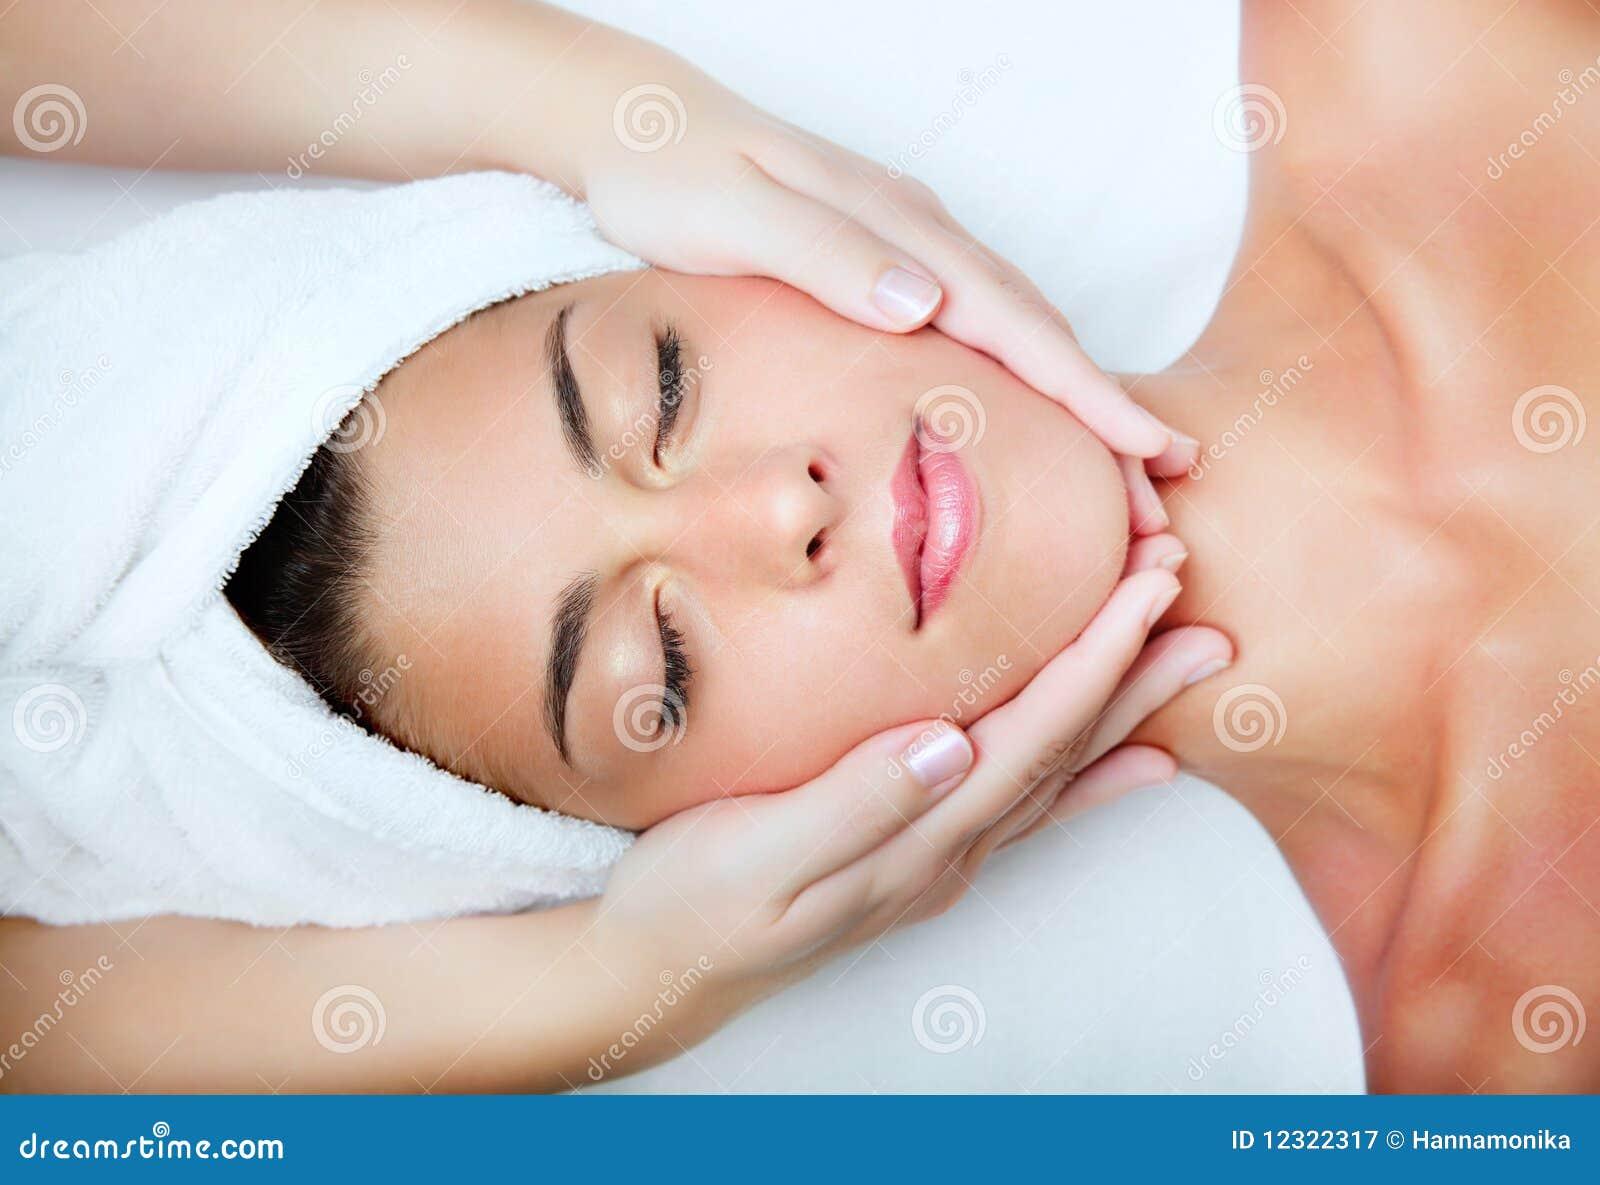 Mujer joven hermosa que recibe masaje facial.